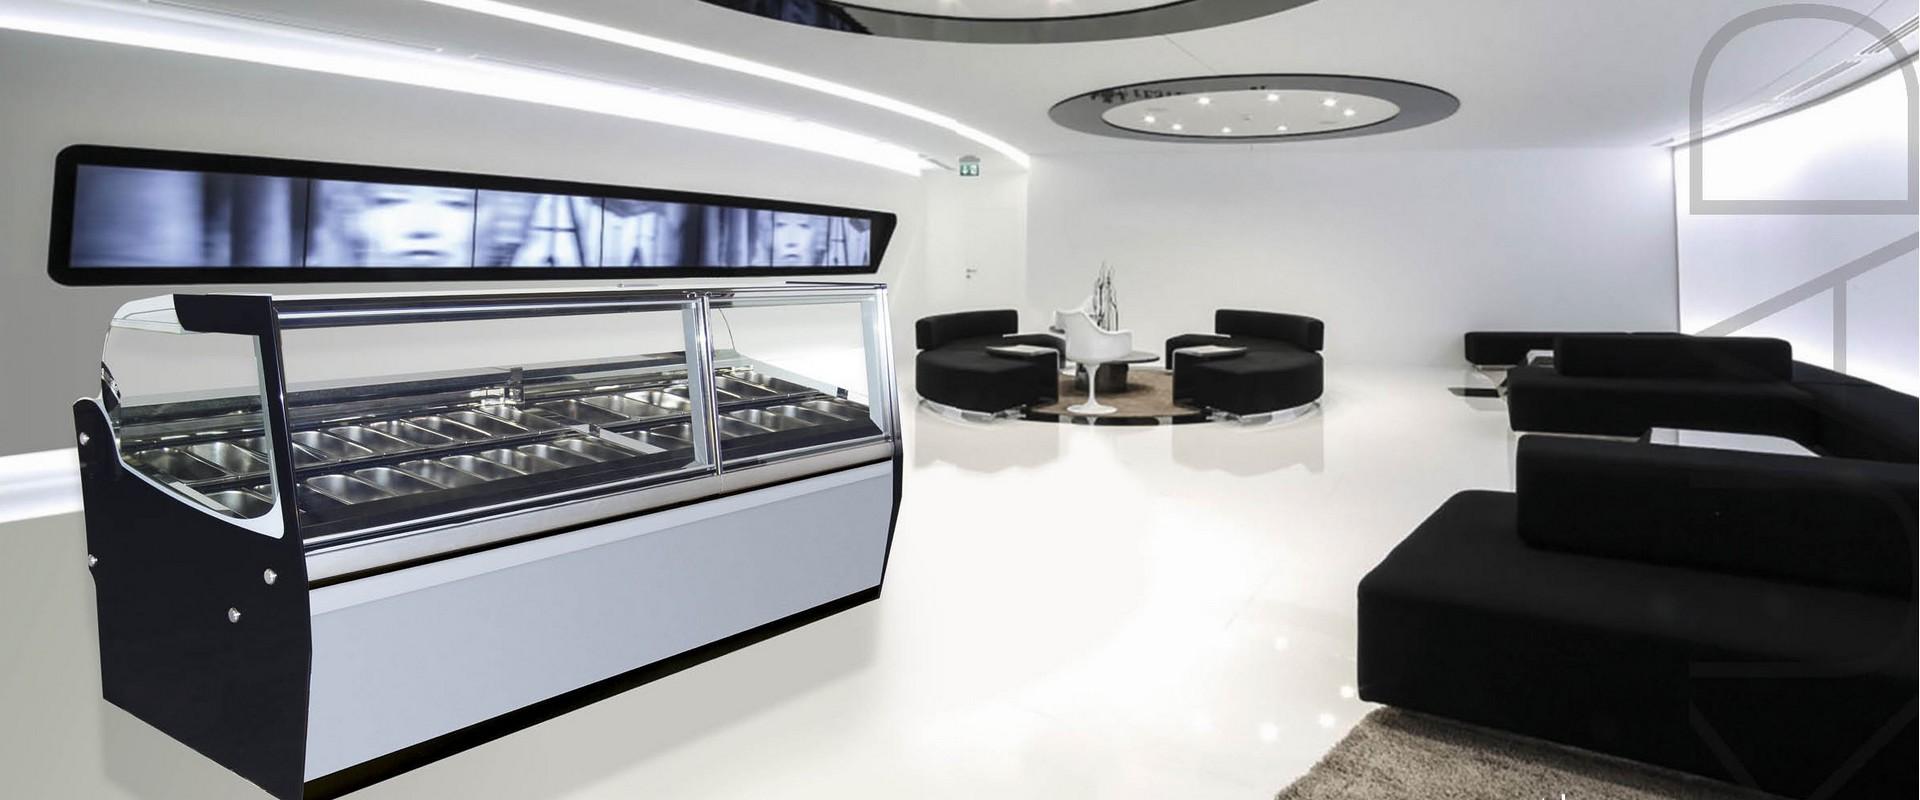 Vetrina gelato Kuadra in ambiente moderno